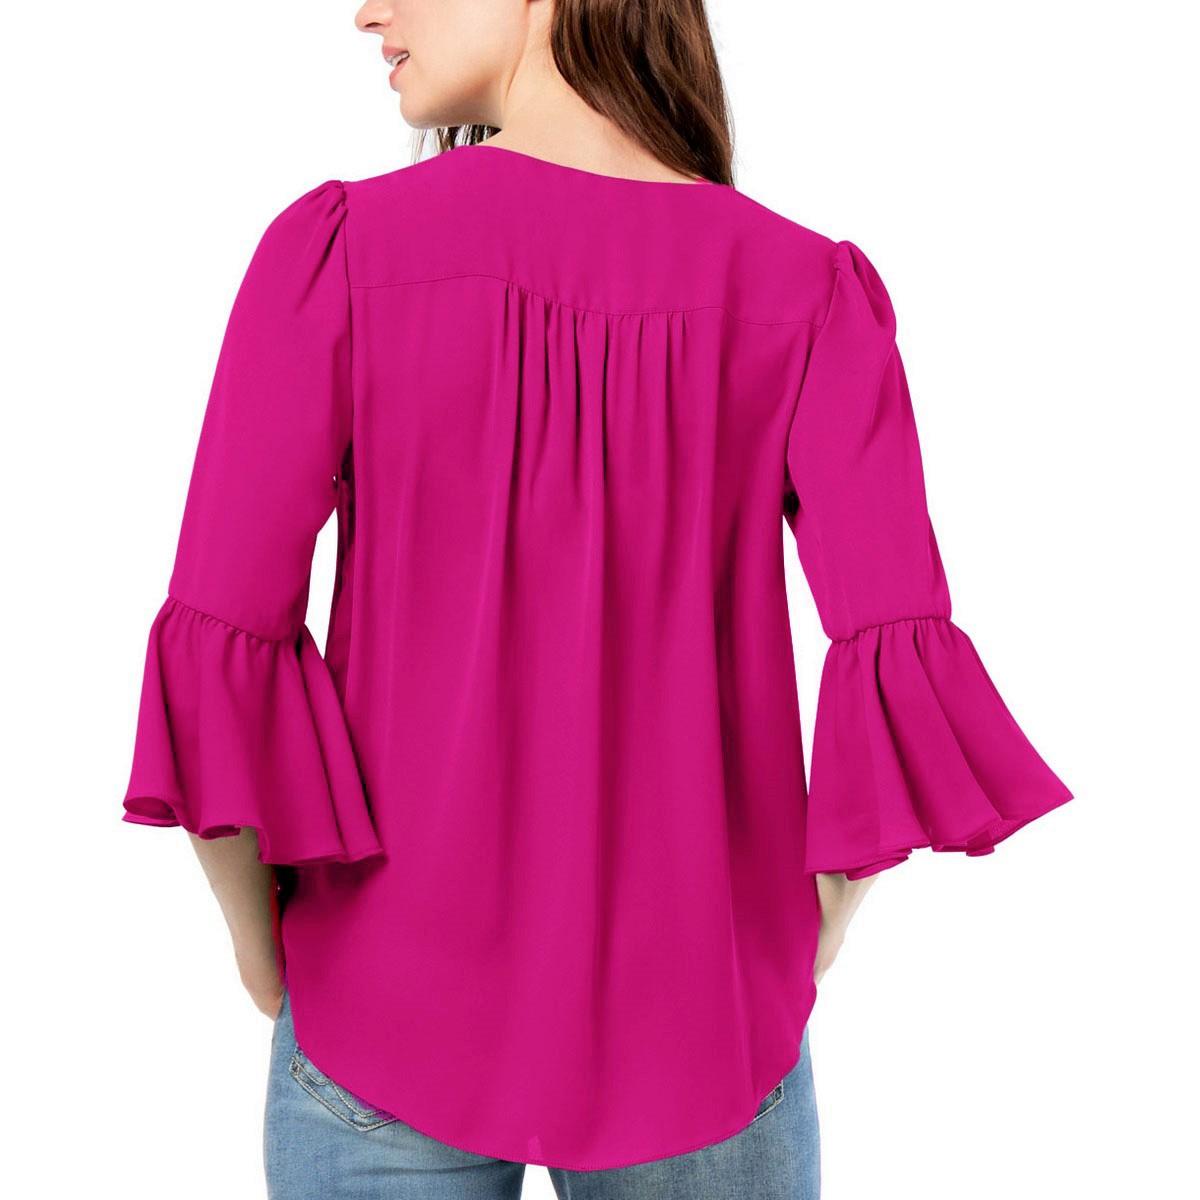 INC-NEW-Women-039-s-Surplice-Bell-Sleeve-High-Low-Blouse-Shirt-Top-TEDO thumbnail 8